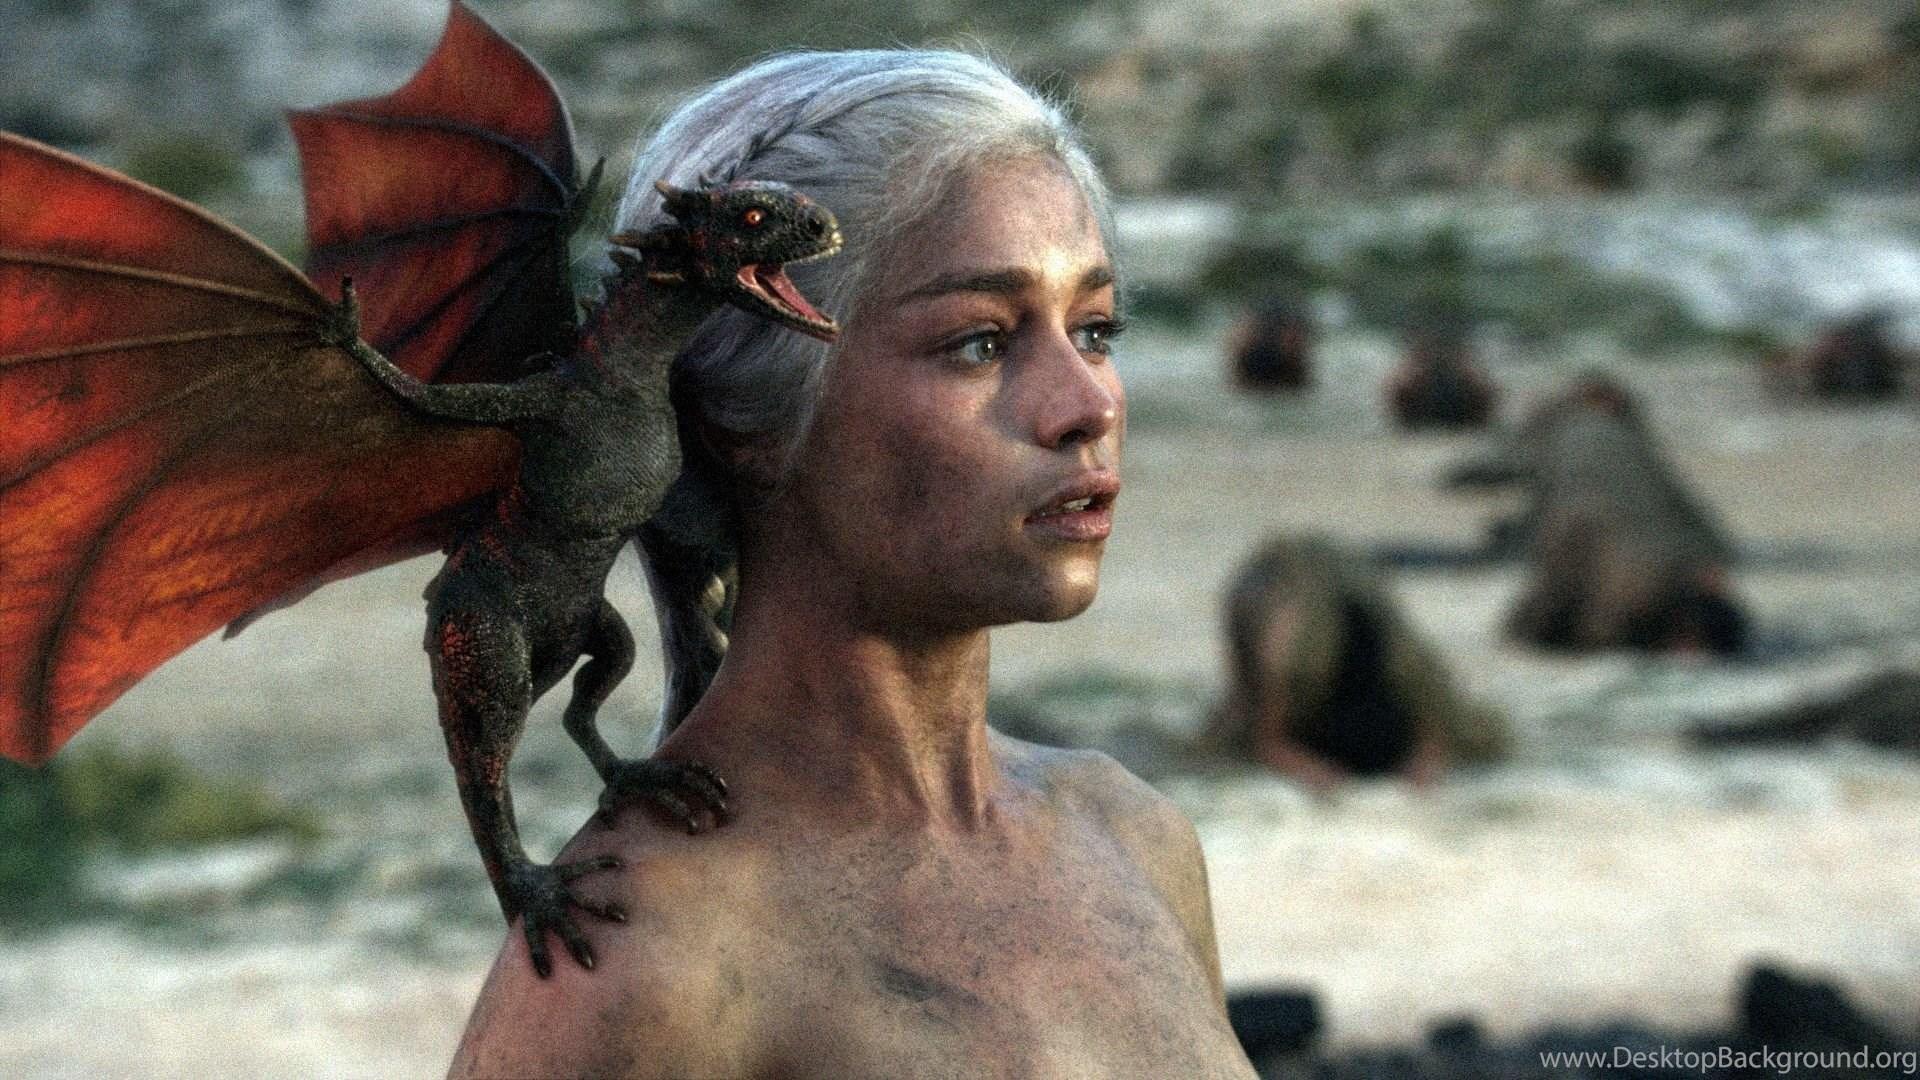 Emilia Clarke Daenerys Targaryen Game Of Thrones Wallpapers